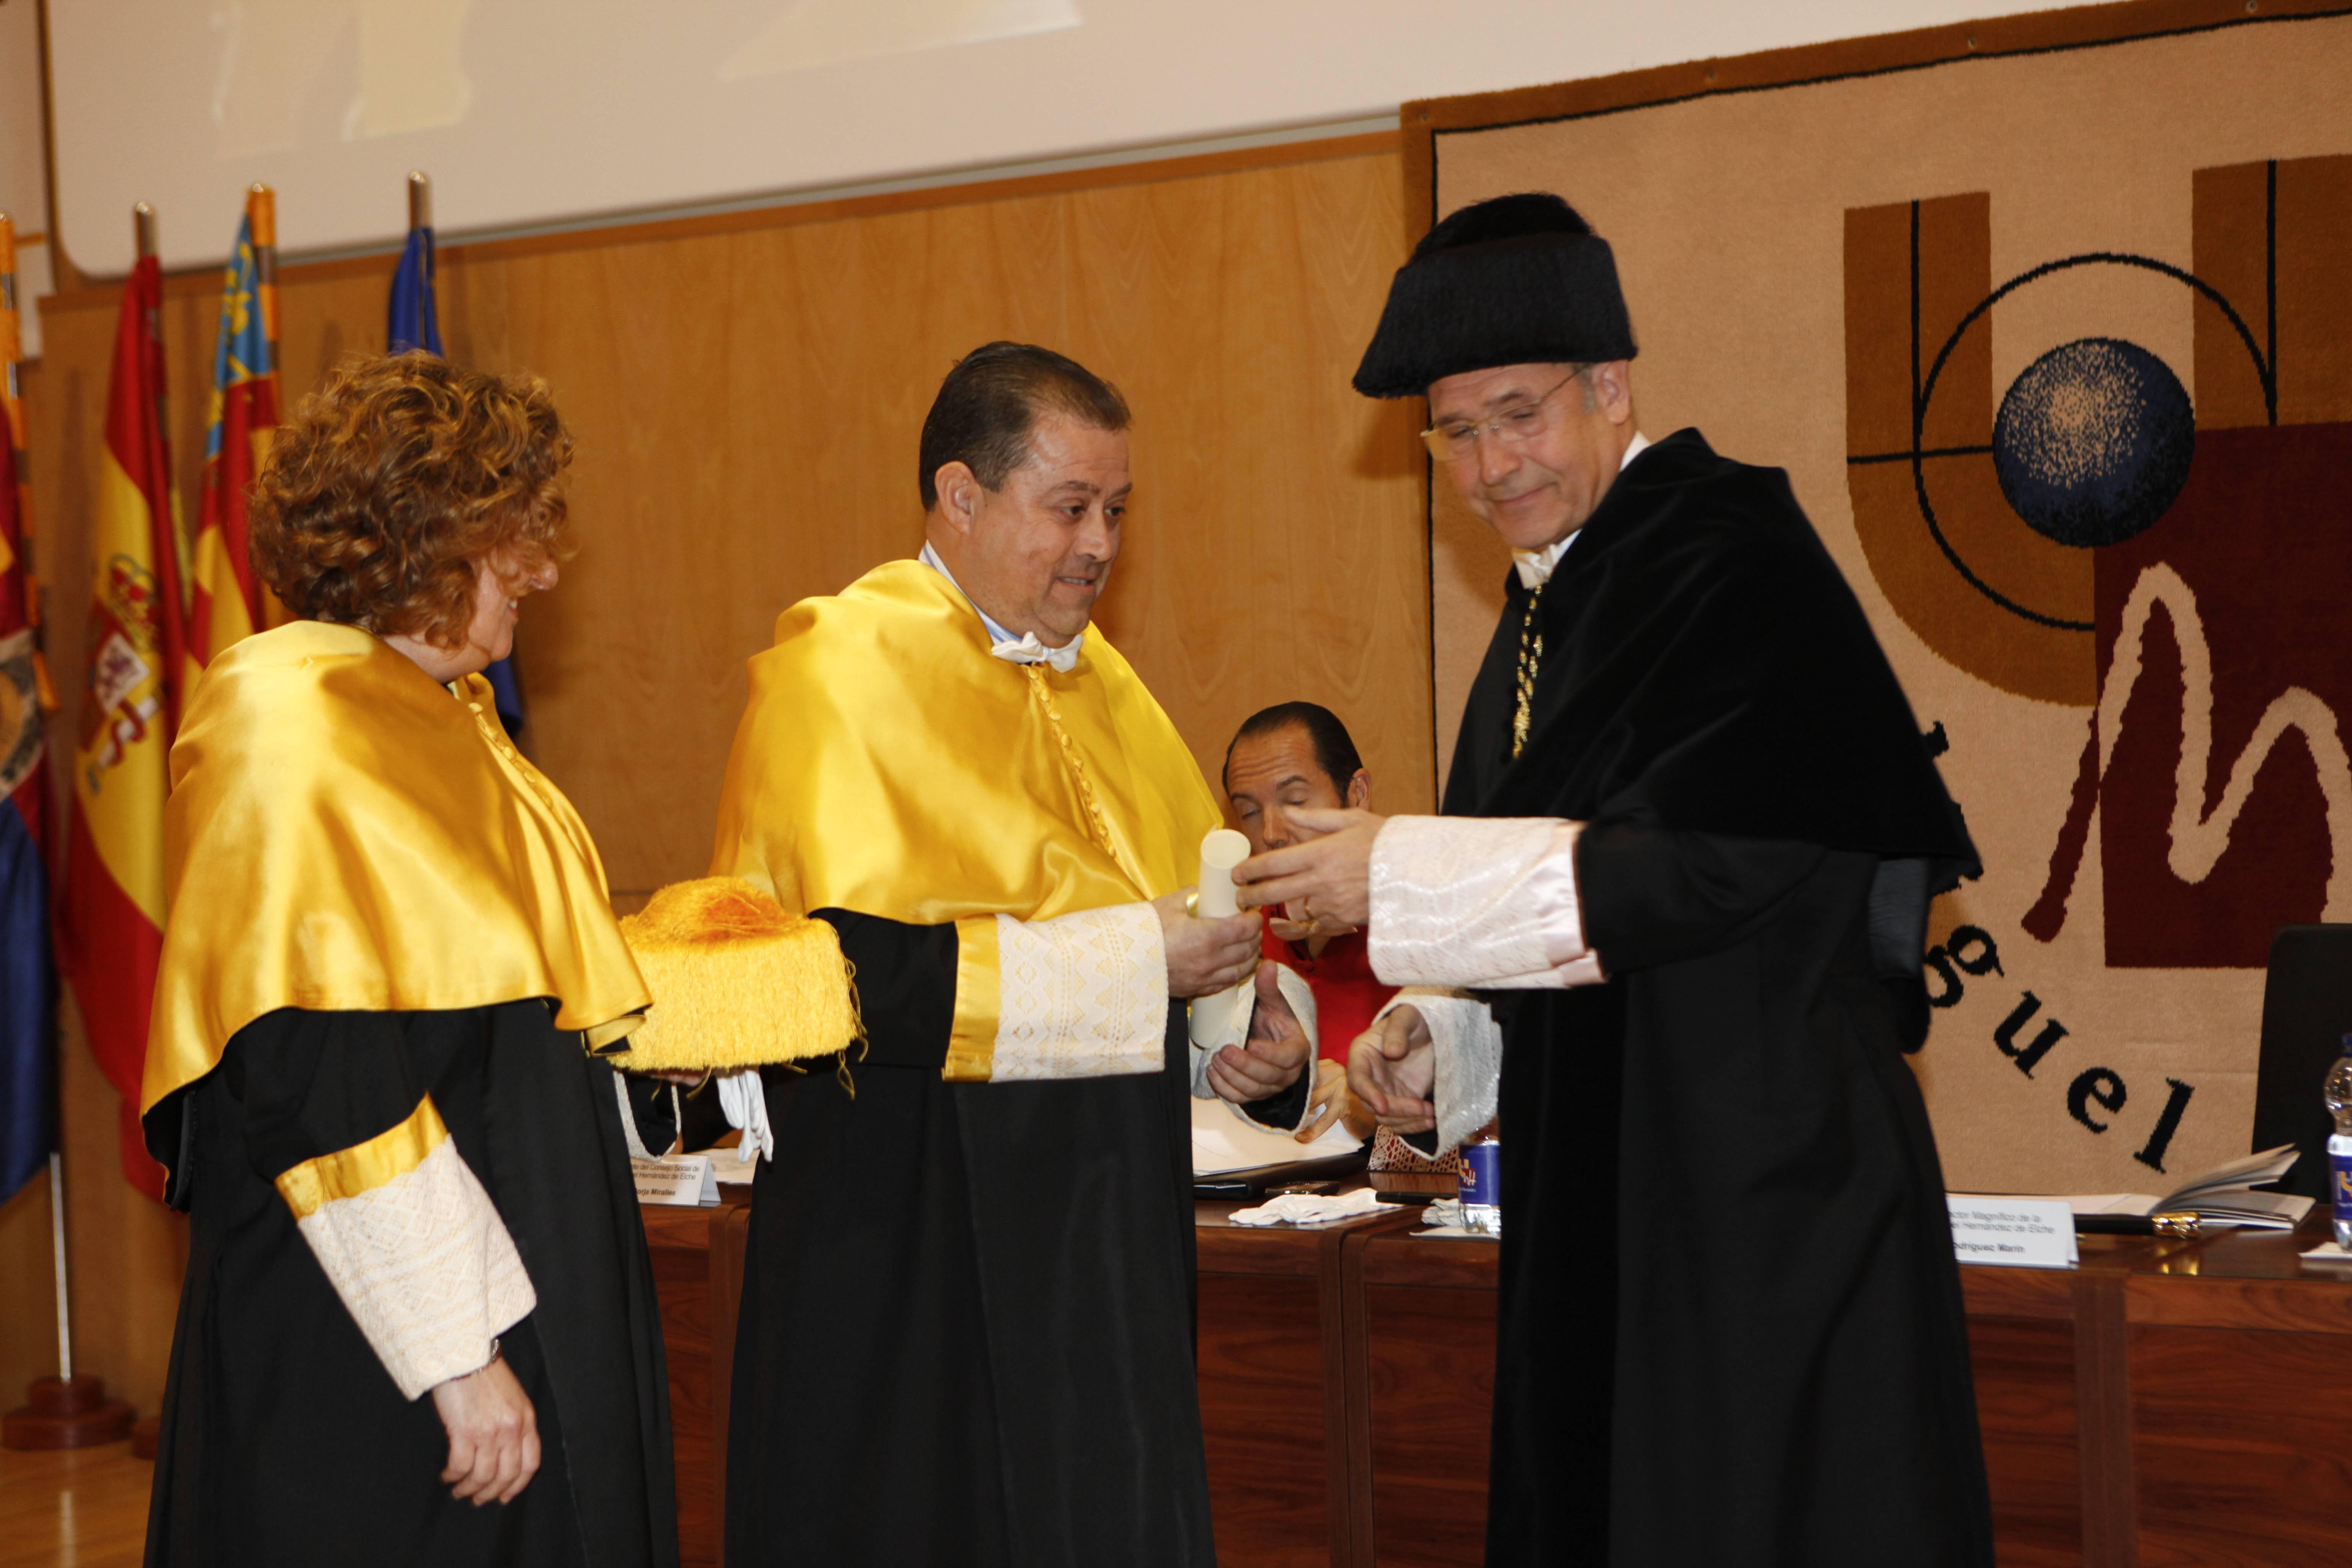 doctor-honoris-causa-luis-gamir_mg_1098.jpg